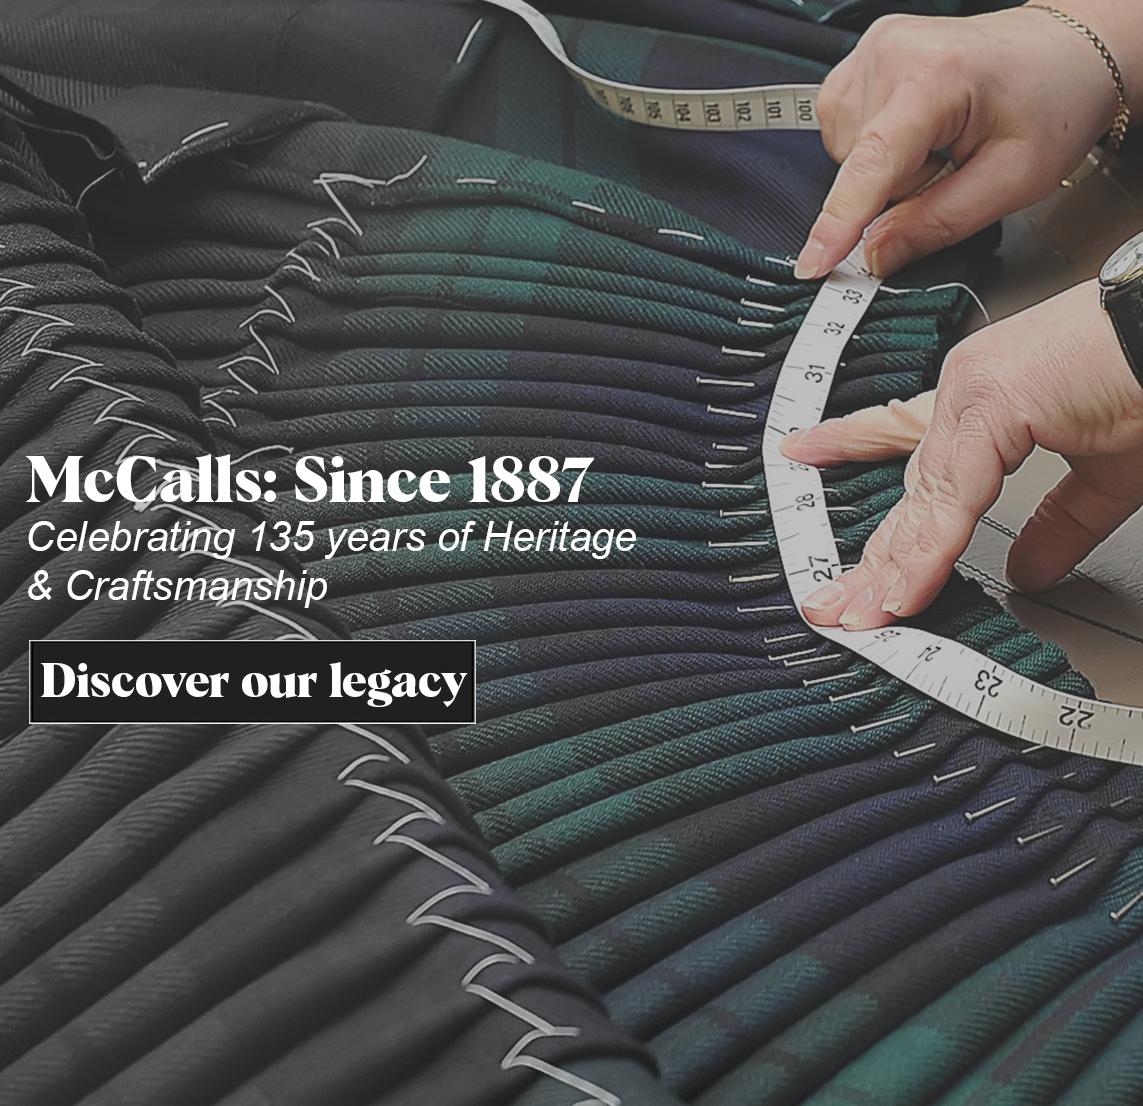 McCalls Pride Range